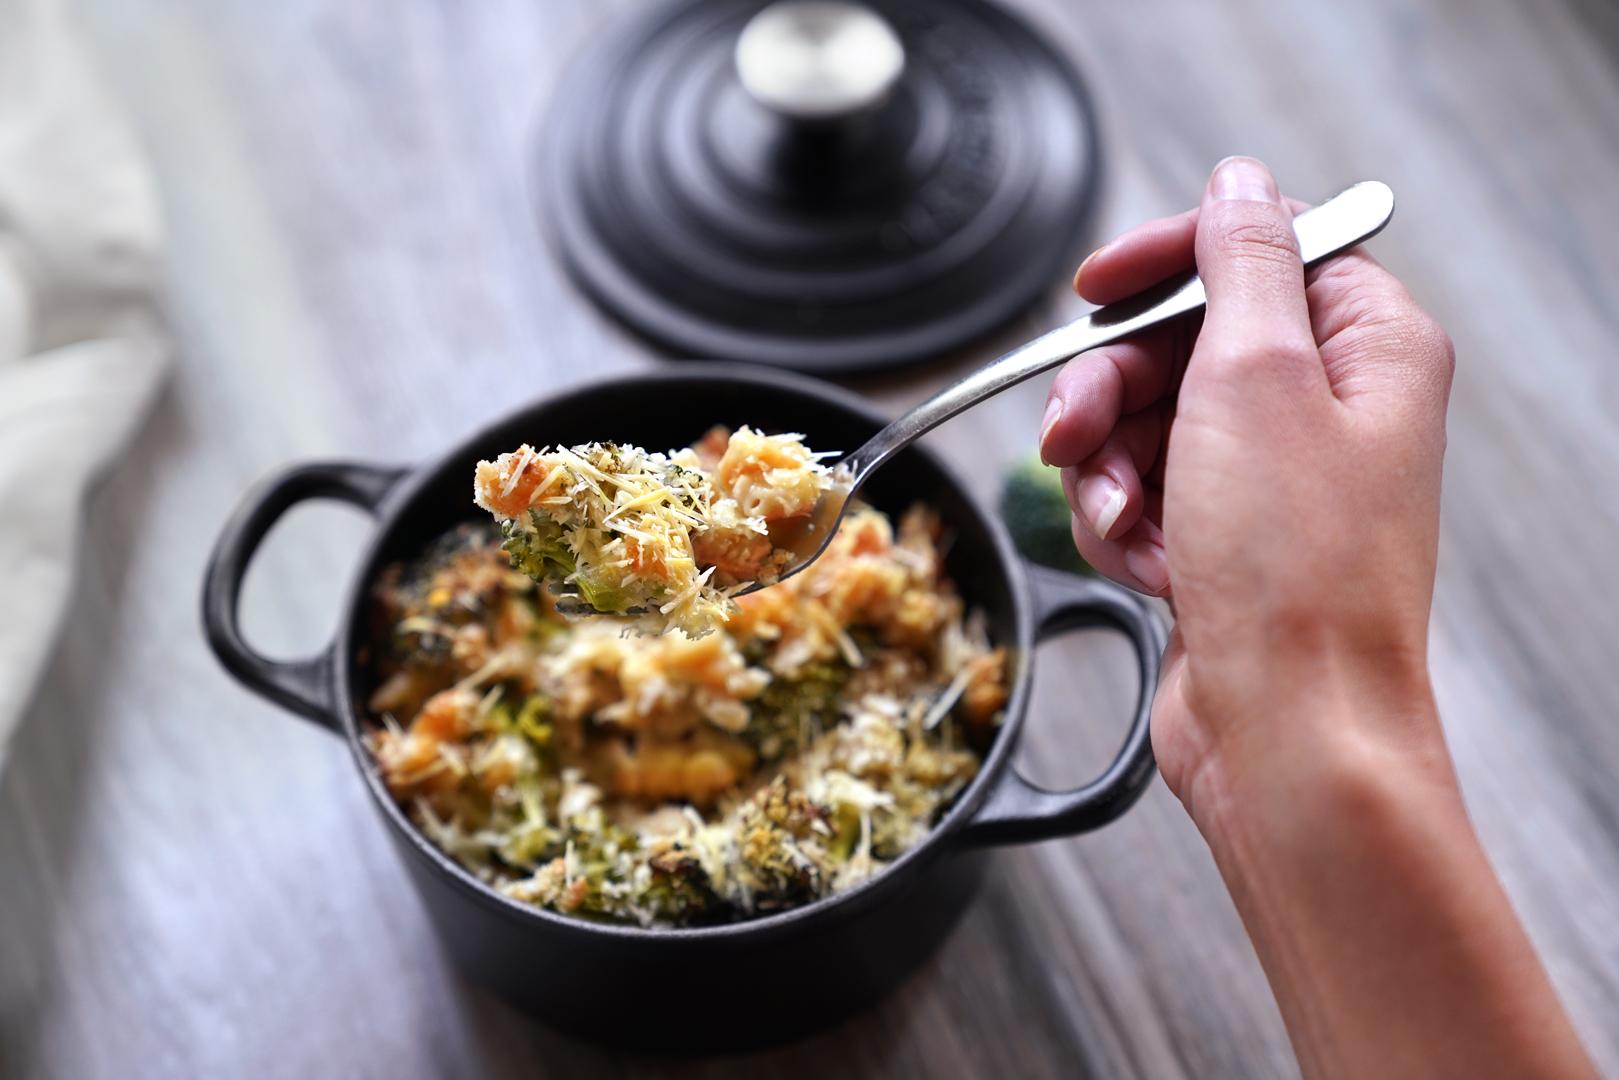 8.18-Cheesy-Broccoli-Bake_edit.jpg